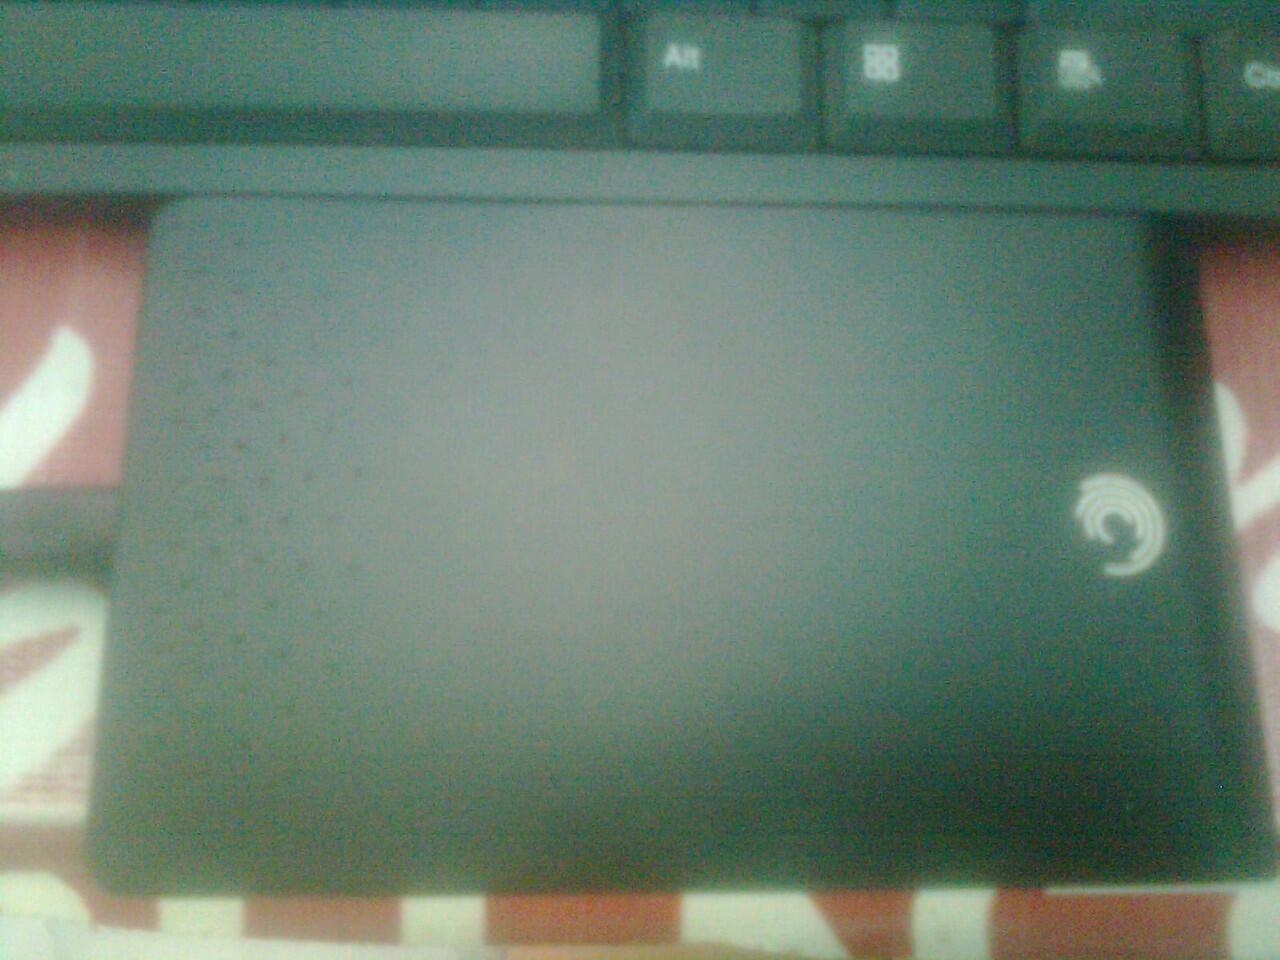 Harddisk Seagate Freeagent 320GB